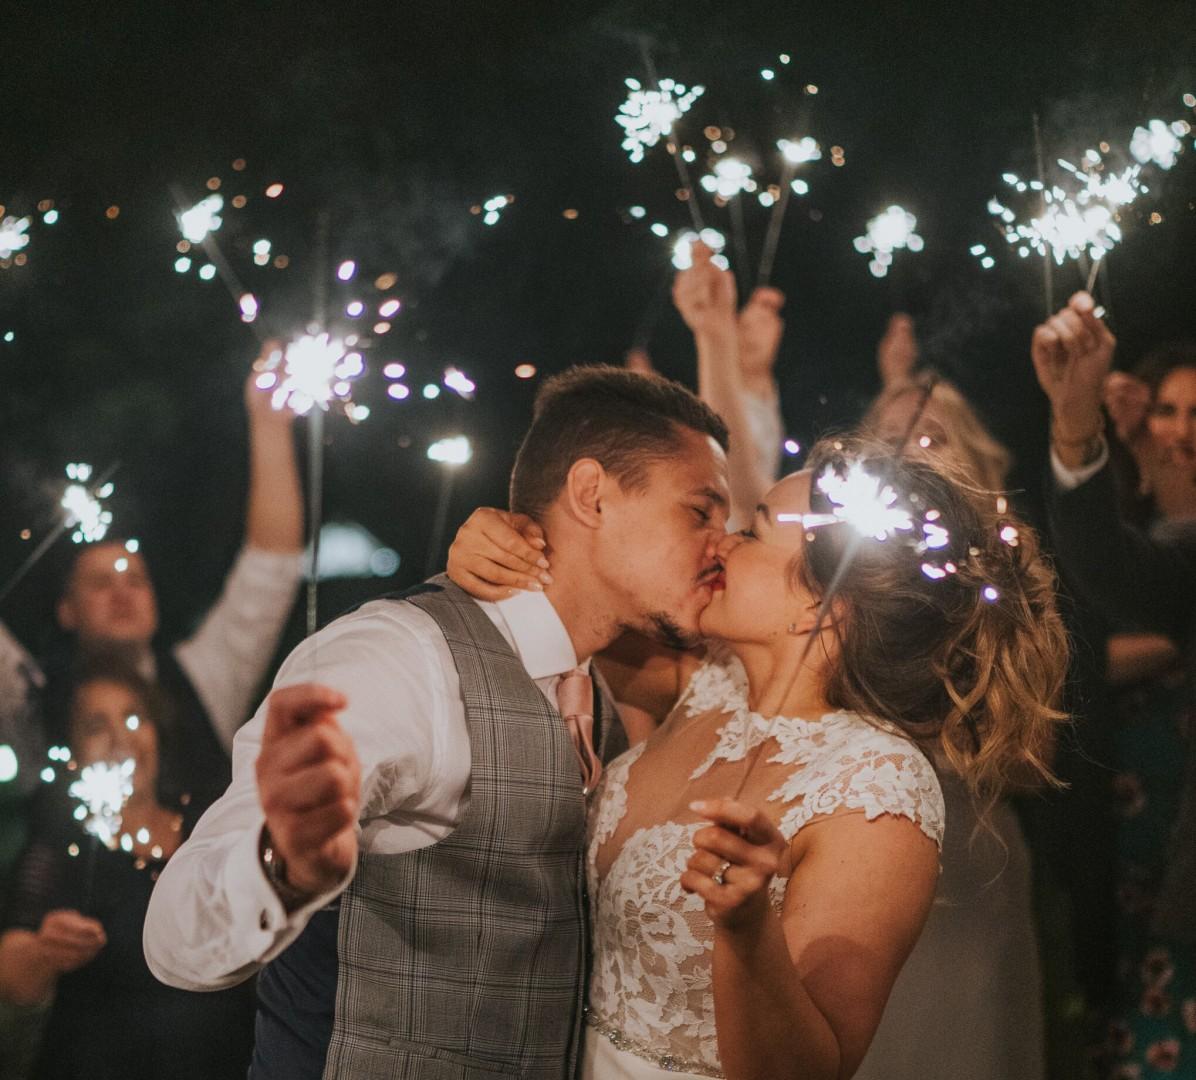 A toast to the era of small stylish weddings